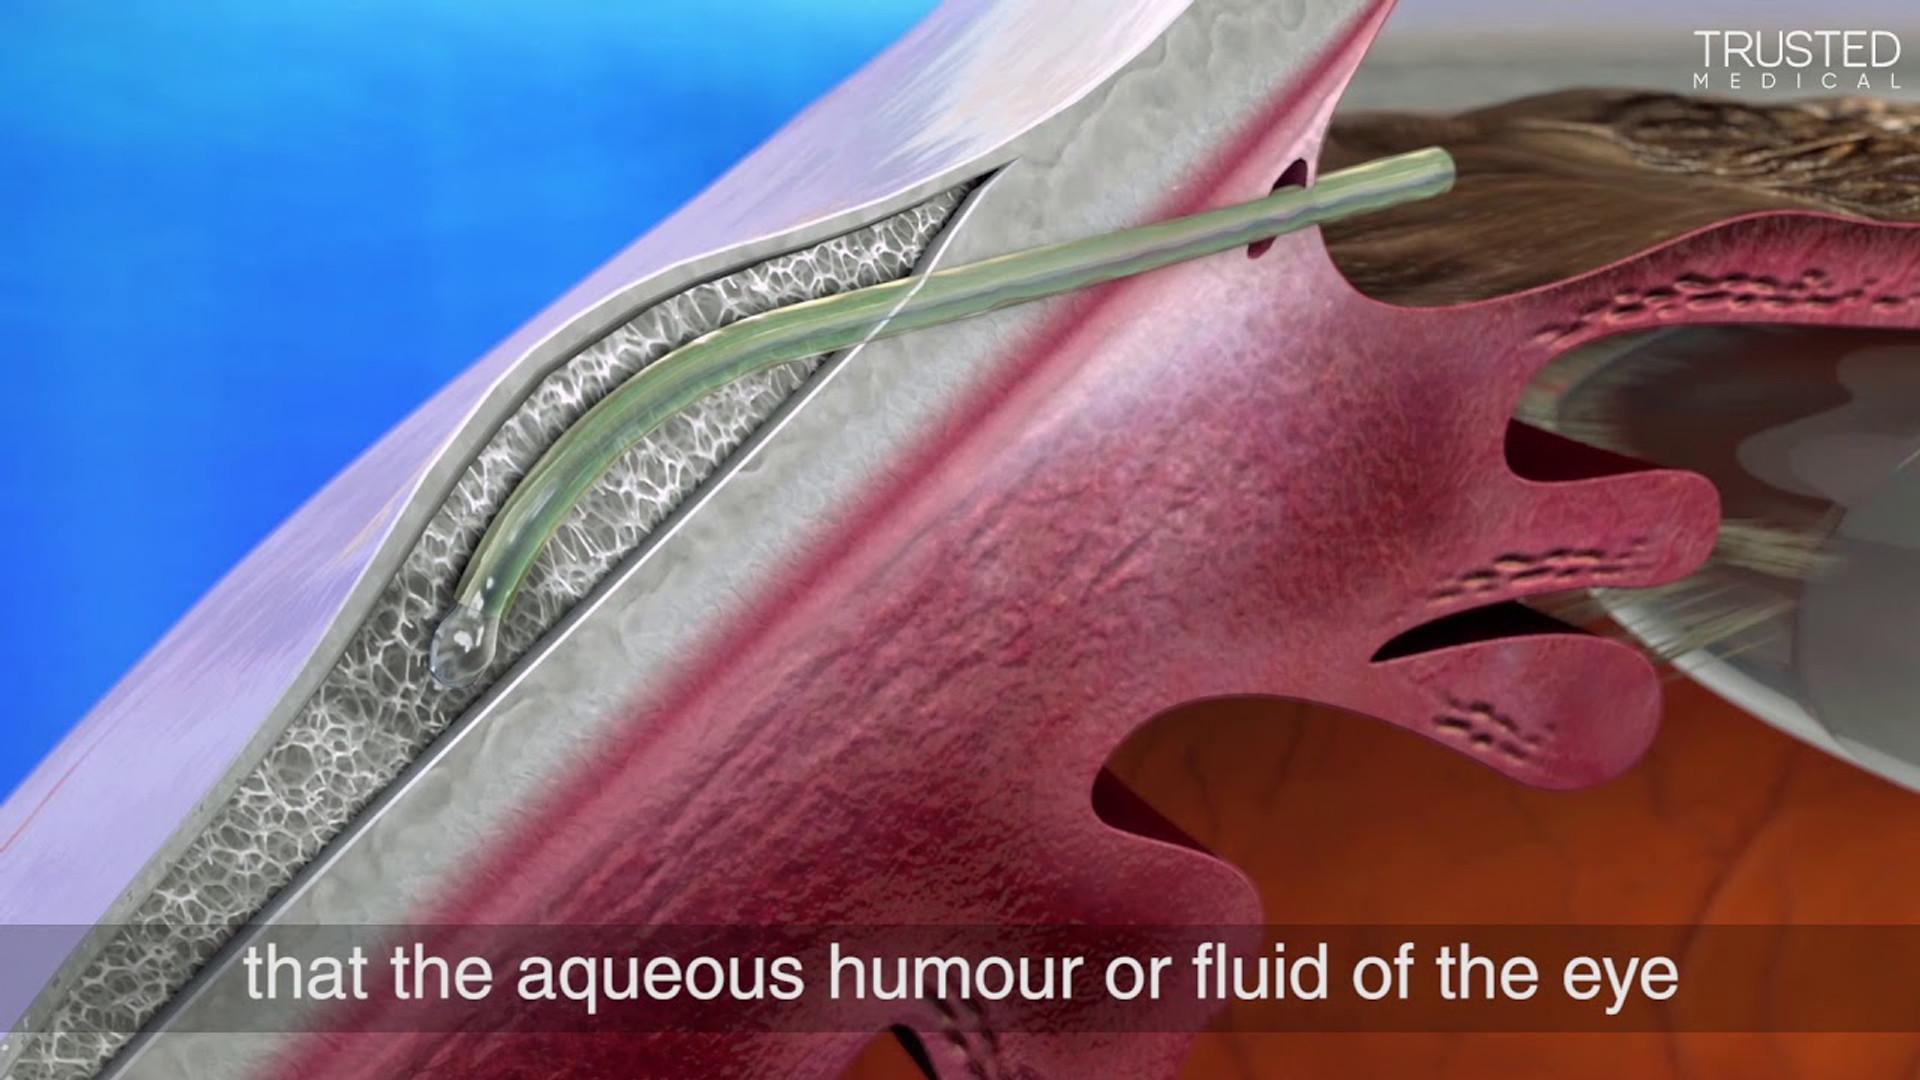 XEN Gel Implant Explanation